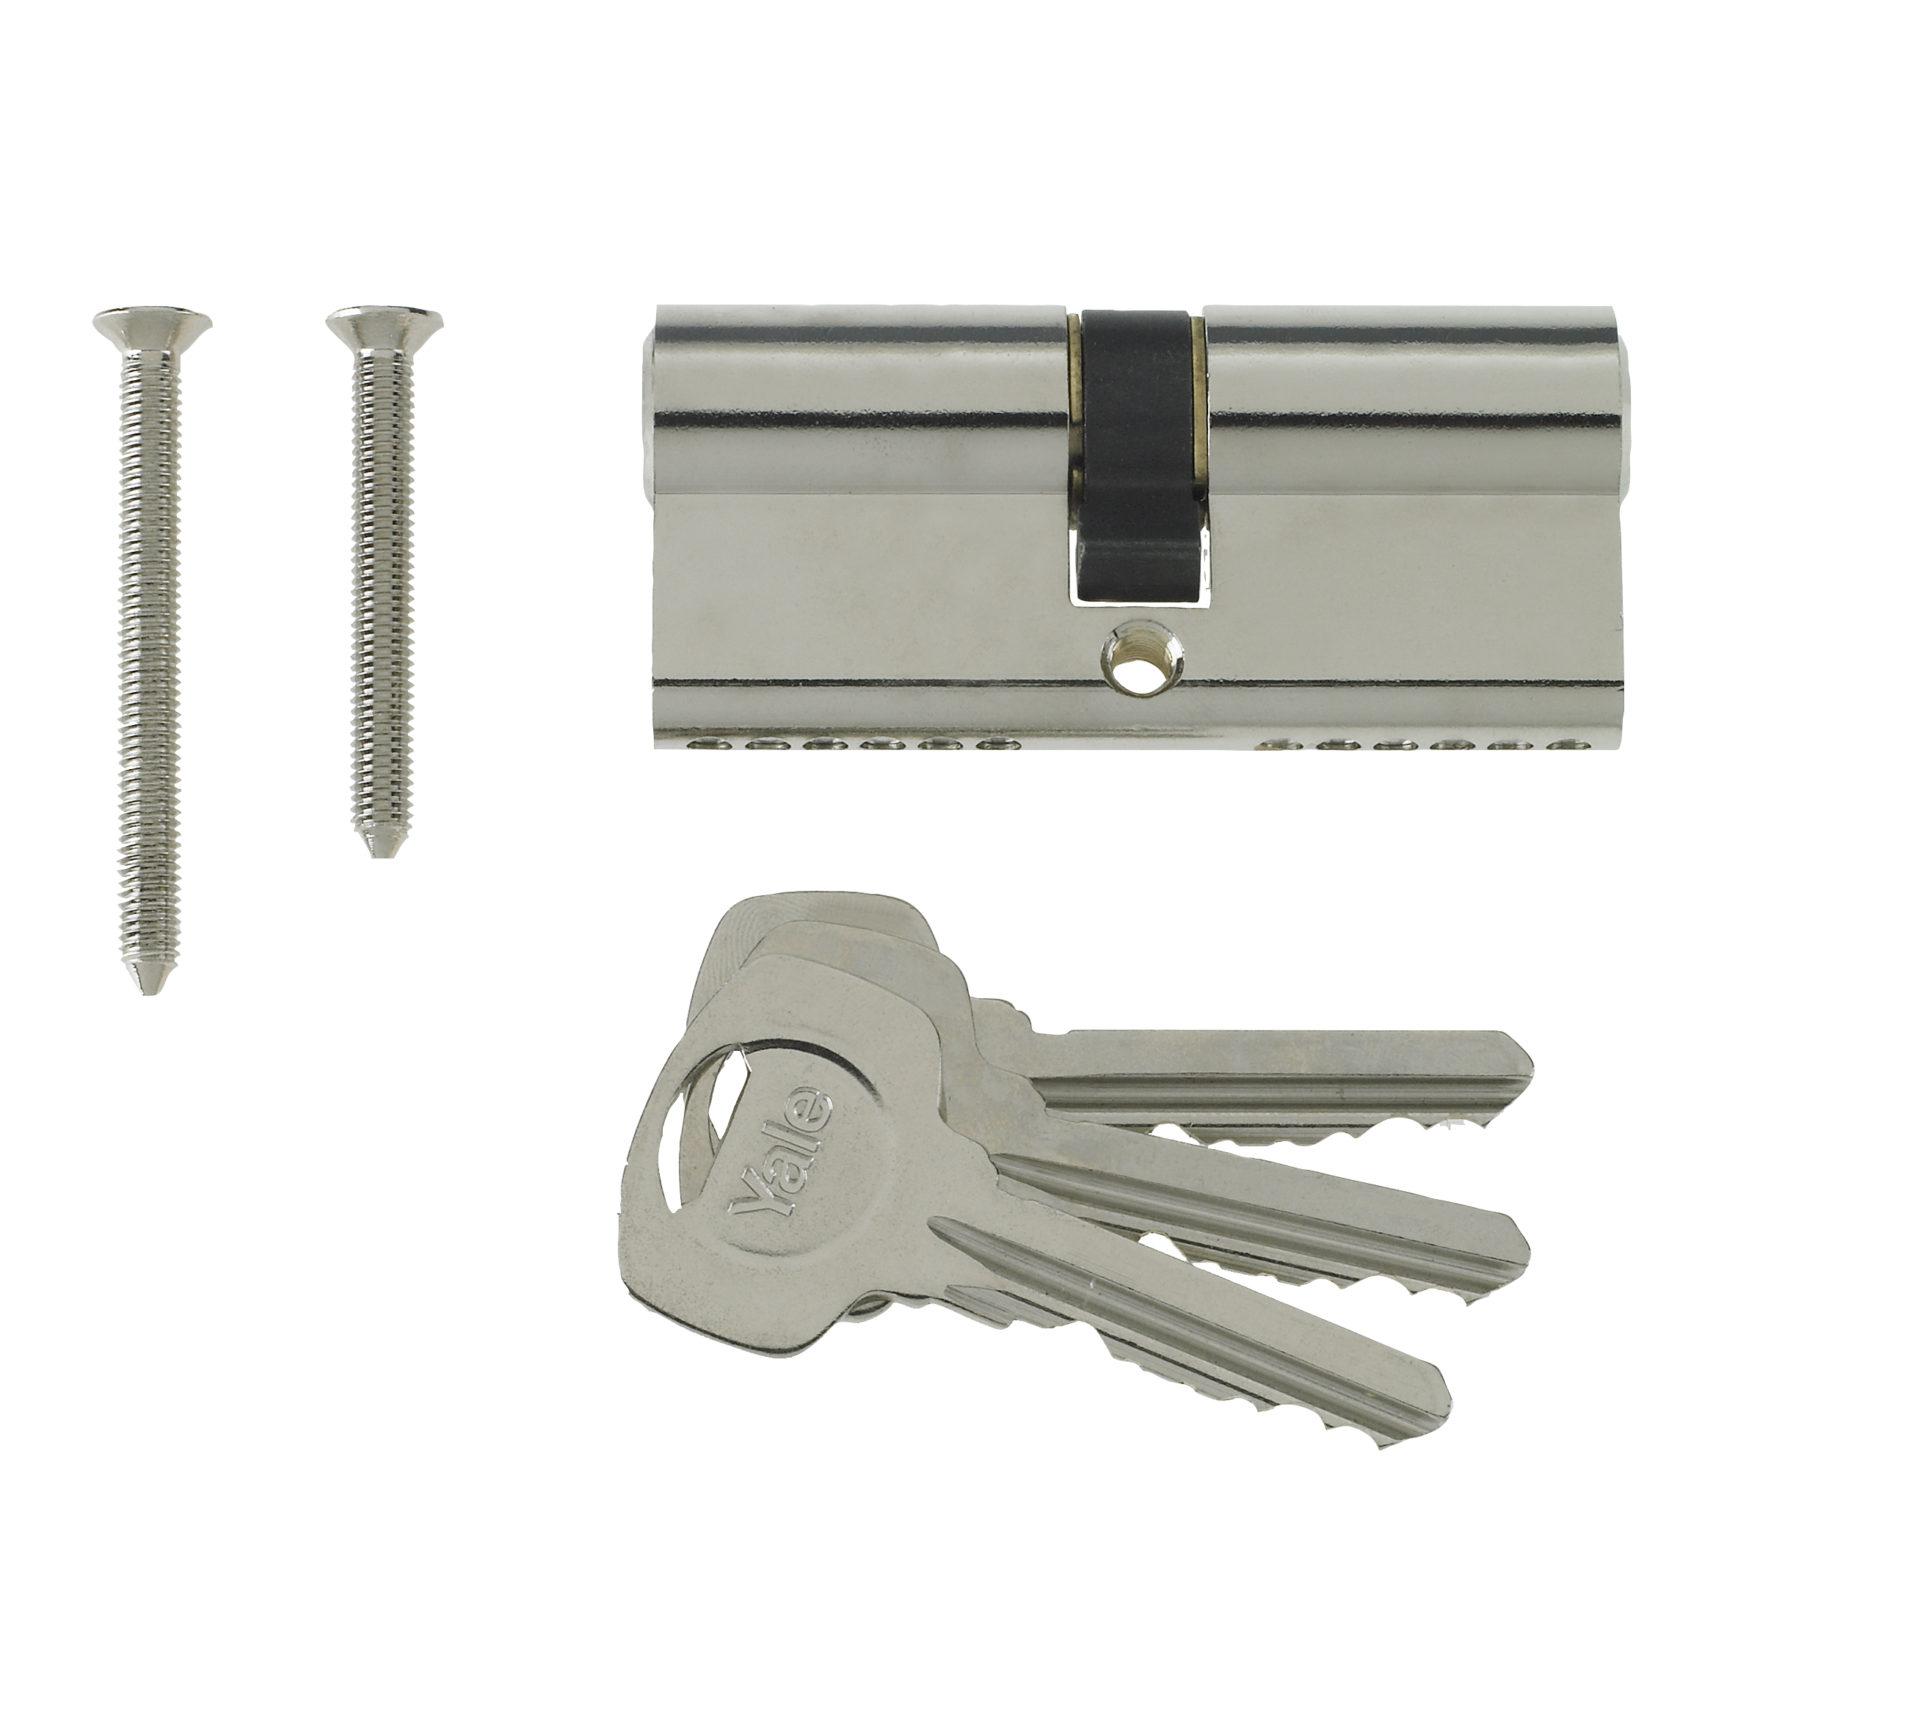 Yale 6 Pin Euro Profile Cylinder Lock Nickle 35/35 (70mm) C/w 3 Keys